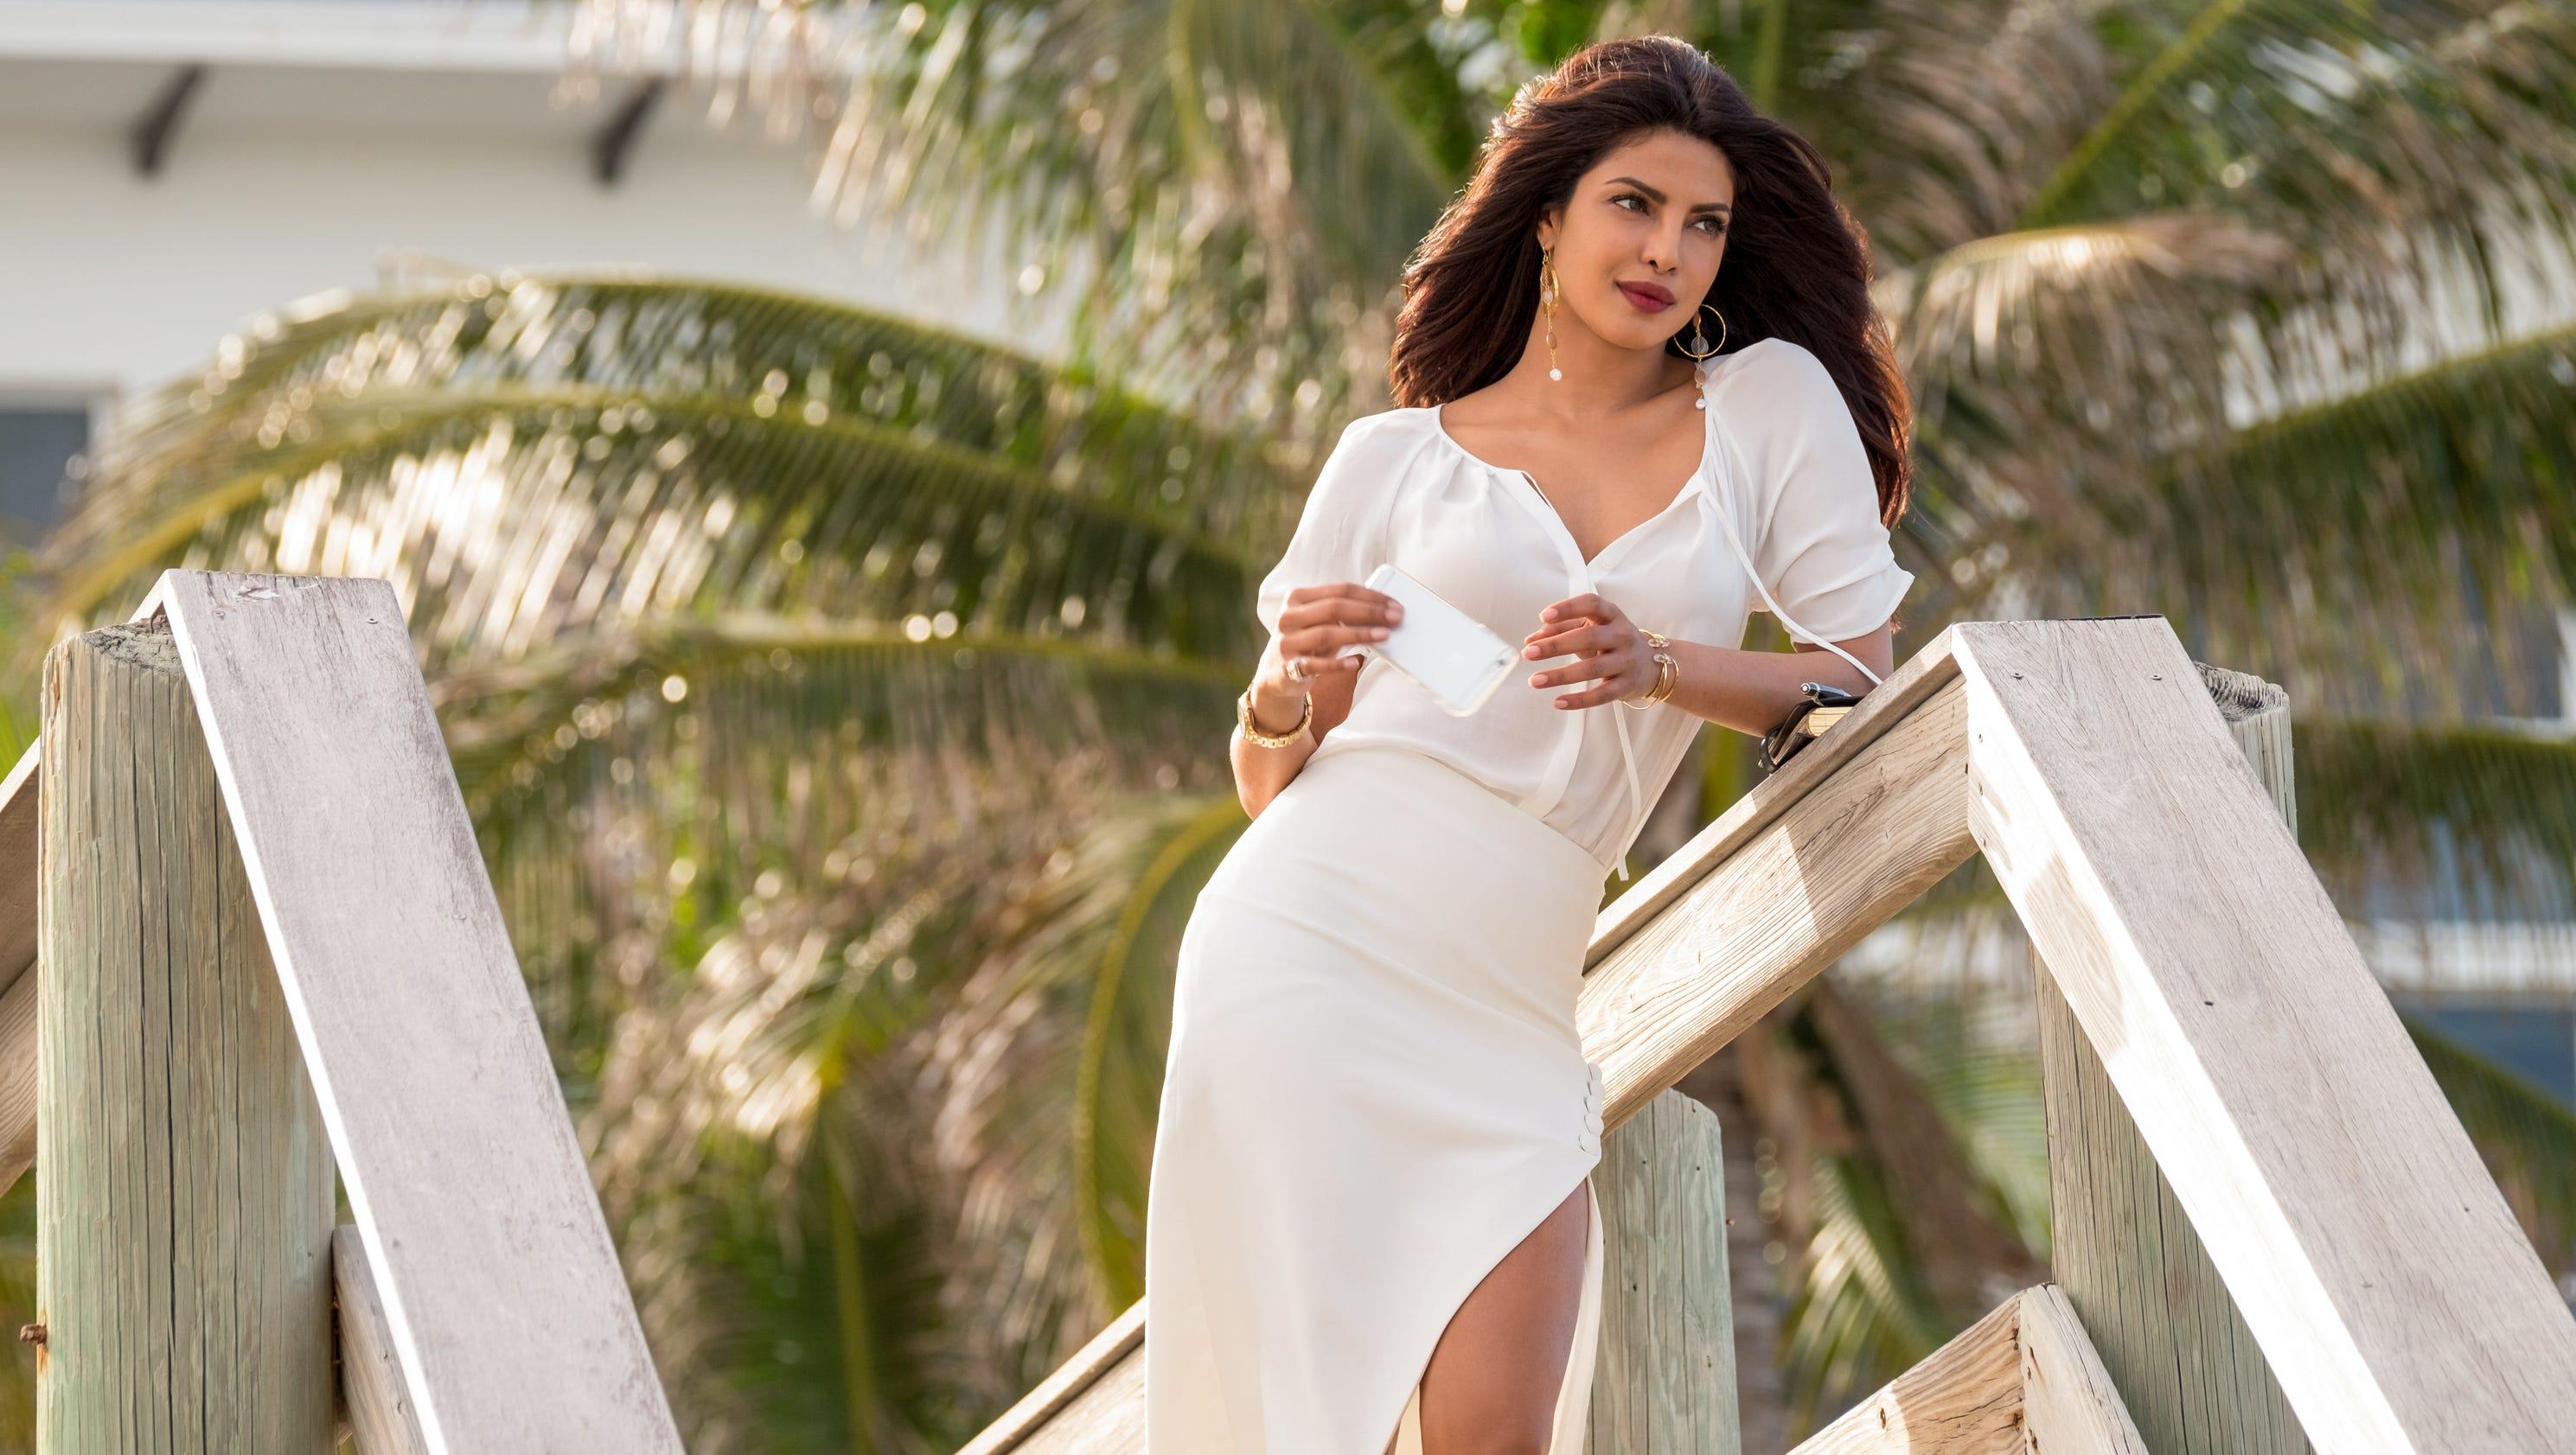 Priyanka Chopra shows the art of Baywatch slow-mo